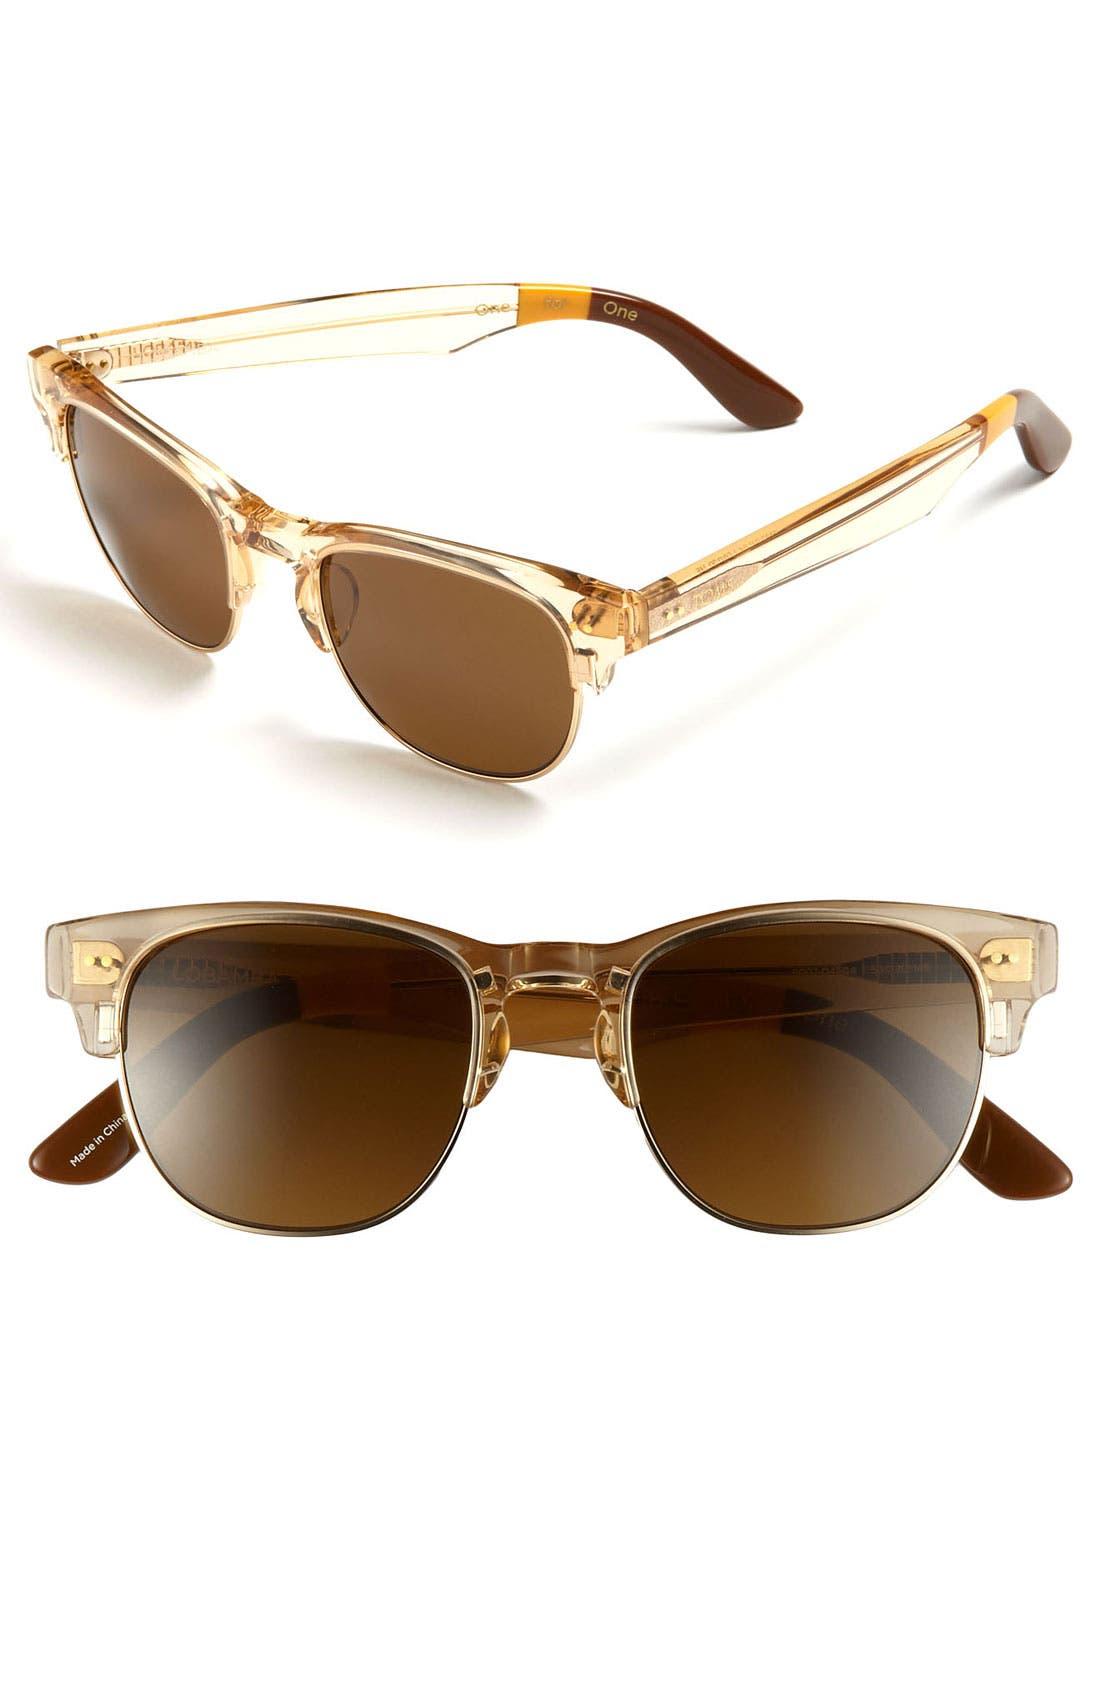 Main Image - TOMS 'Modern' Retro 50mm Sunglasses